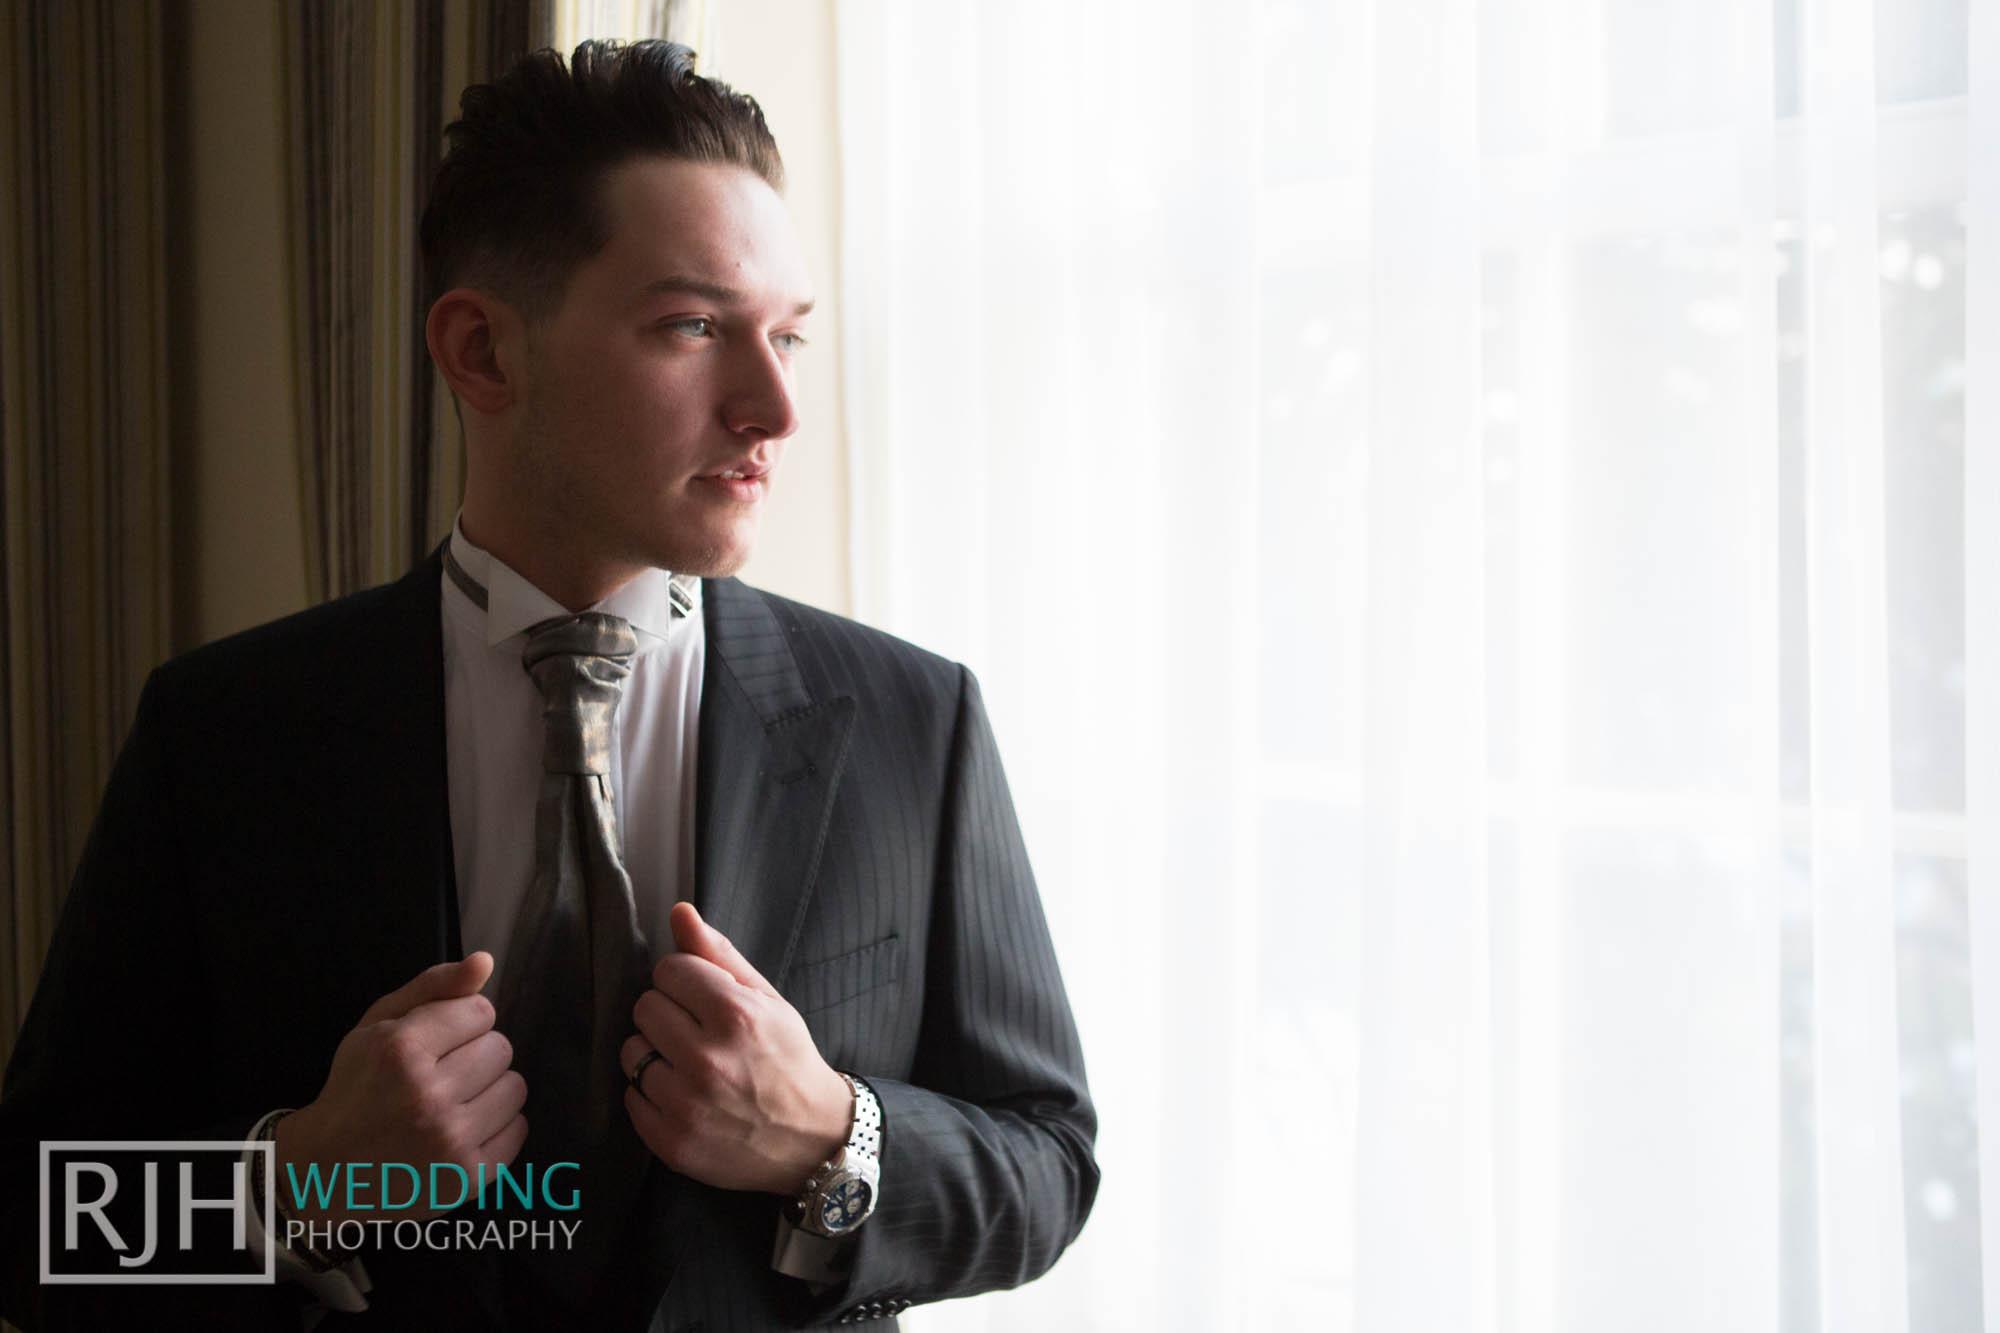 RJH Wedding Photography_2014 highlights_59.jpg